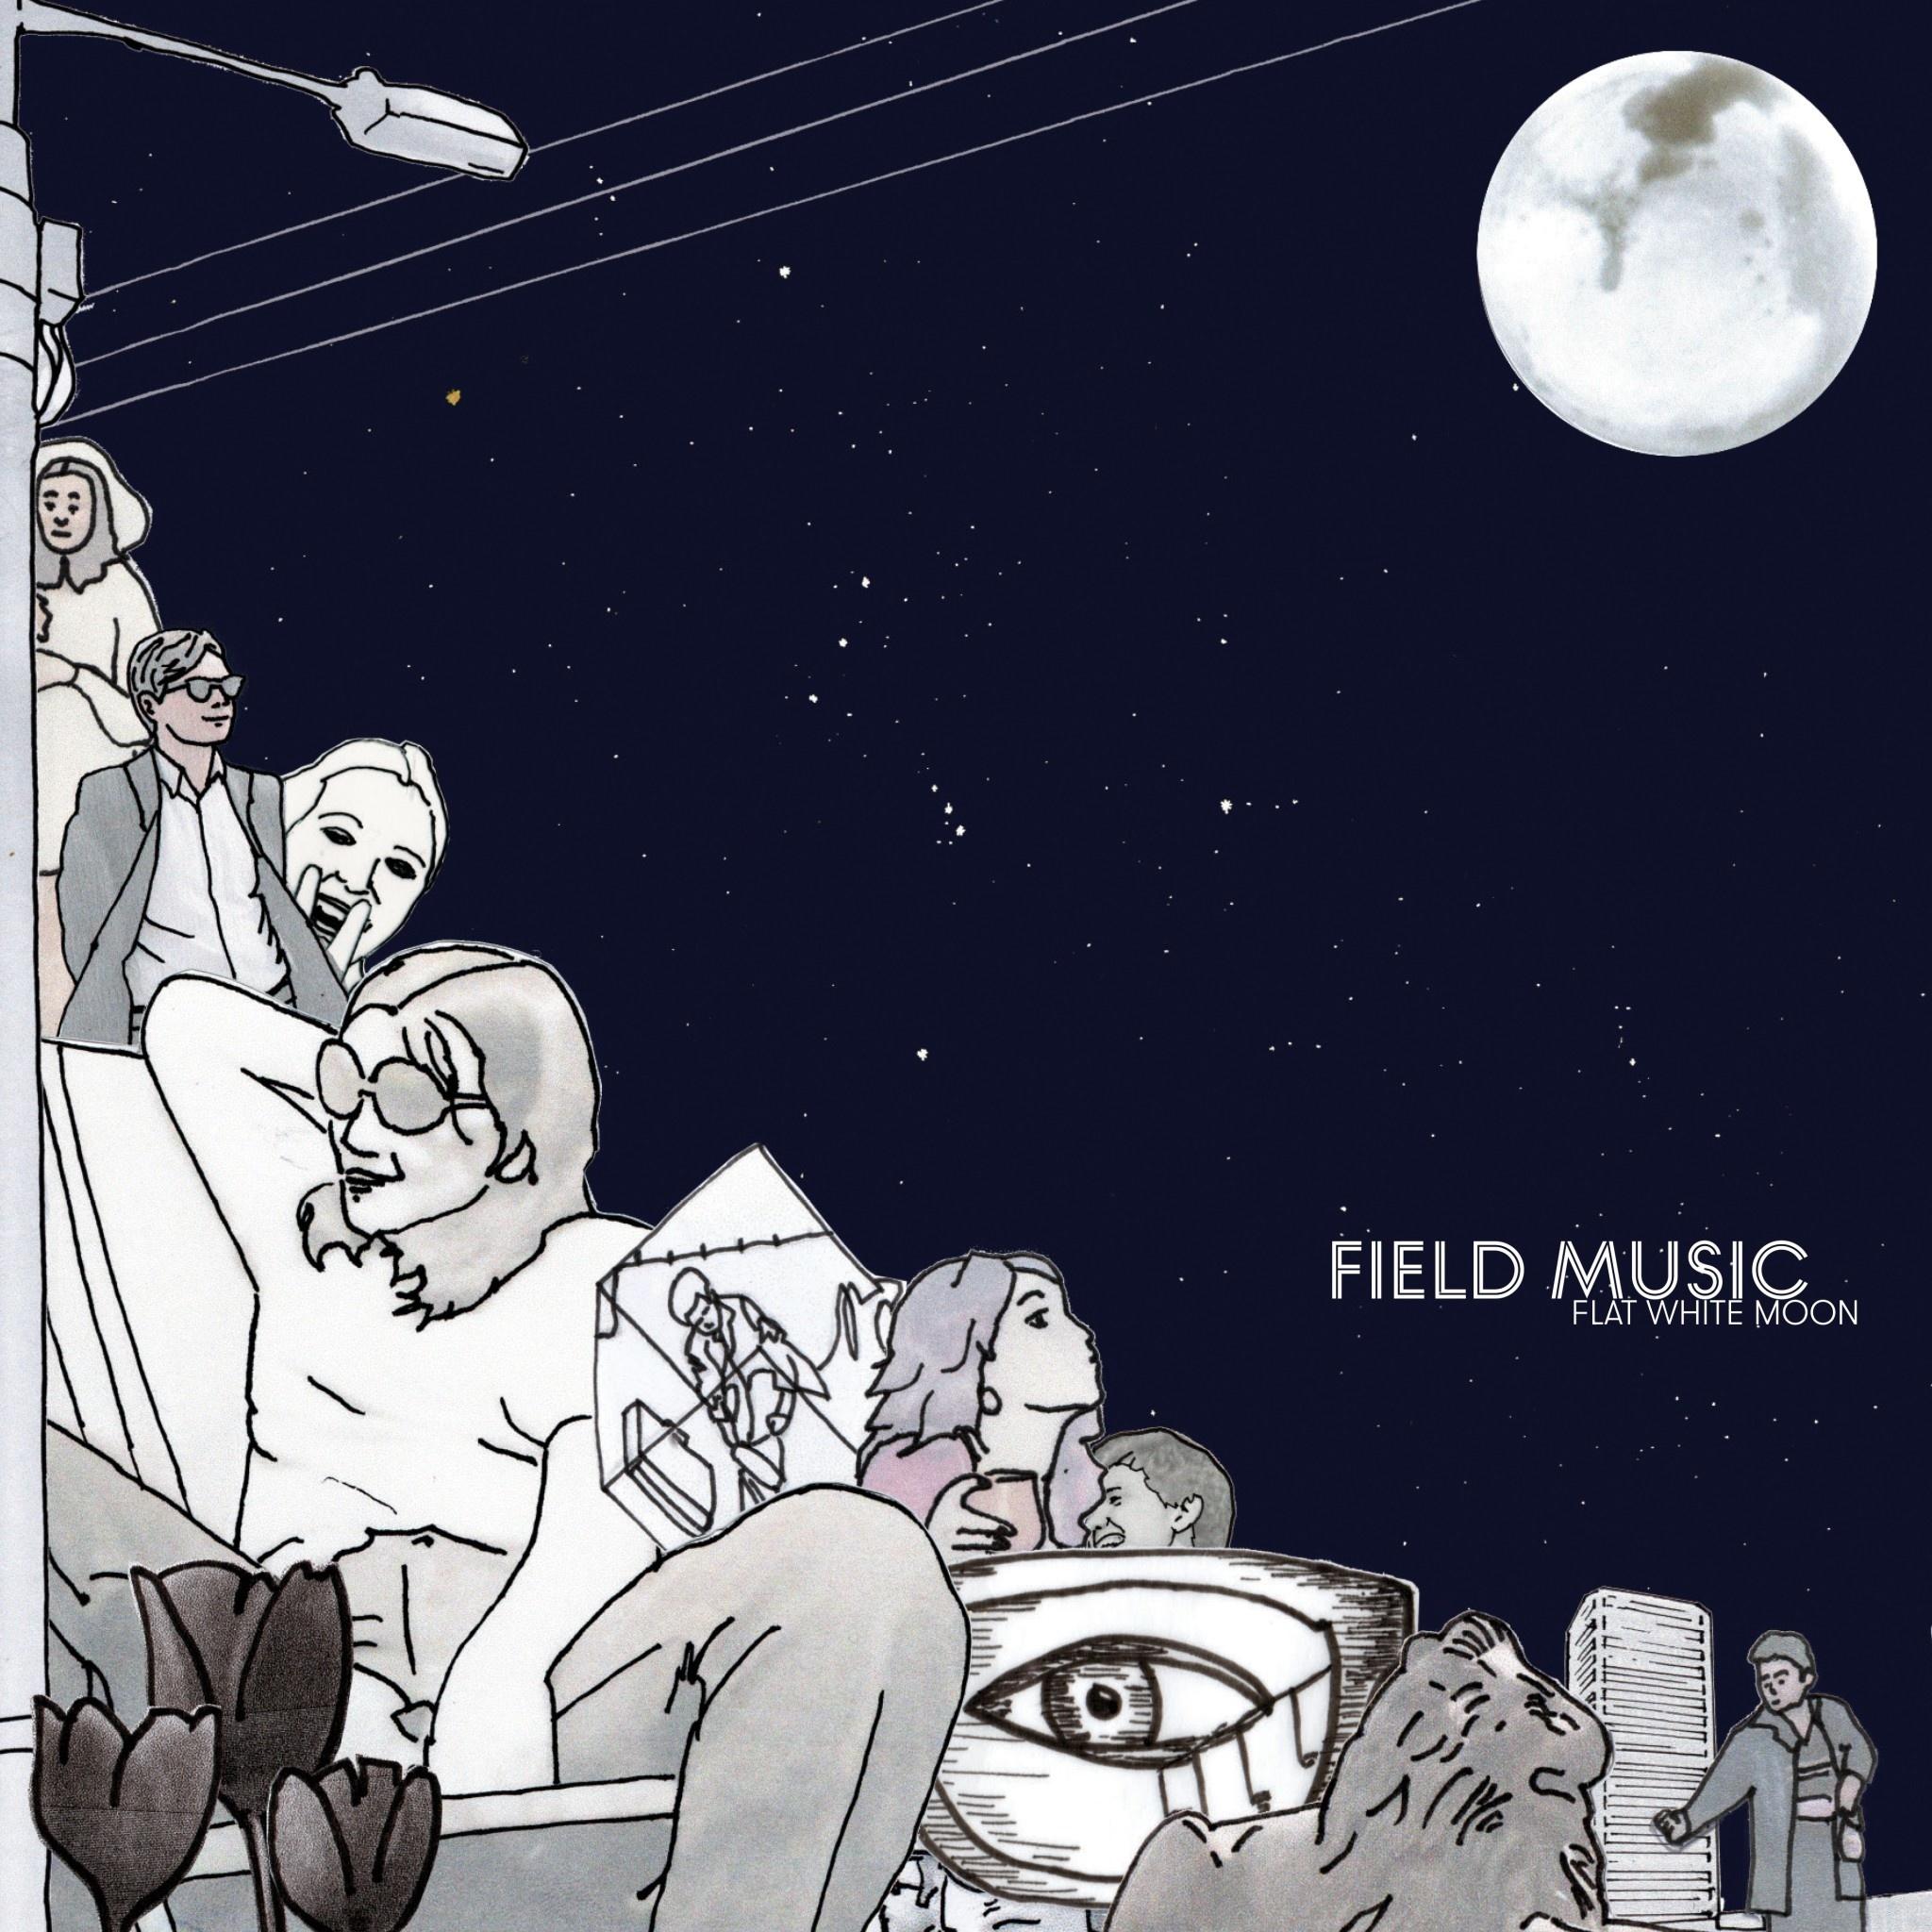 Memphis Industries Field Music - Flat White Moon (Coloured Vinyl)